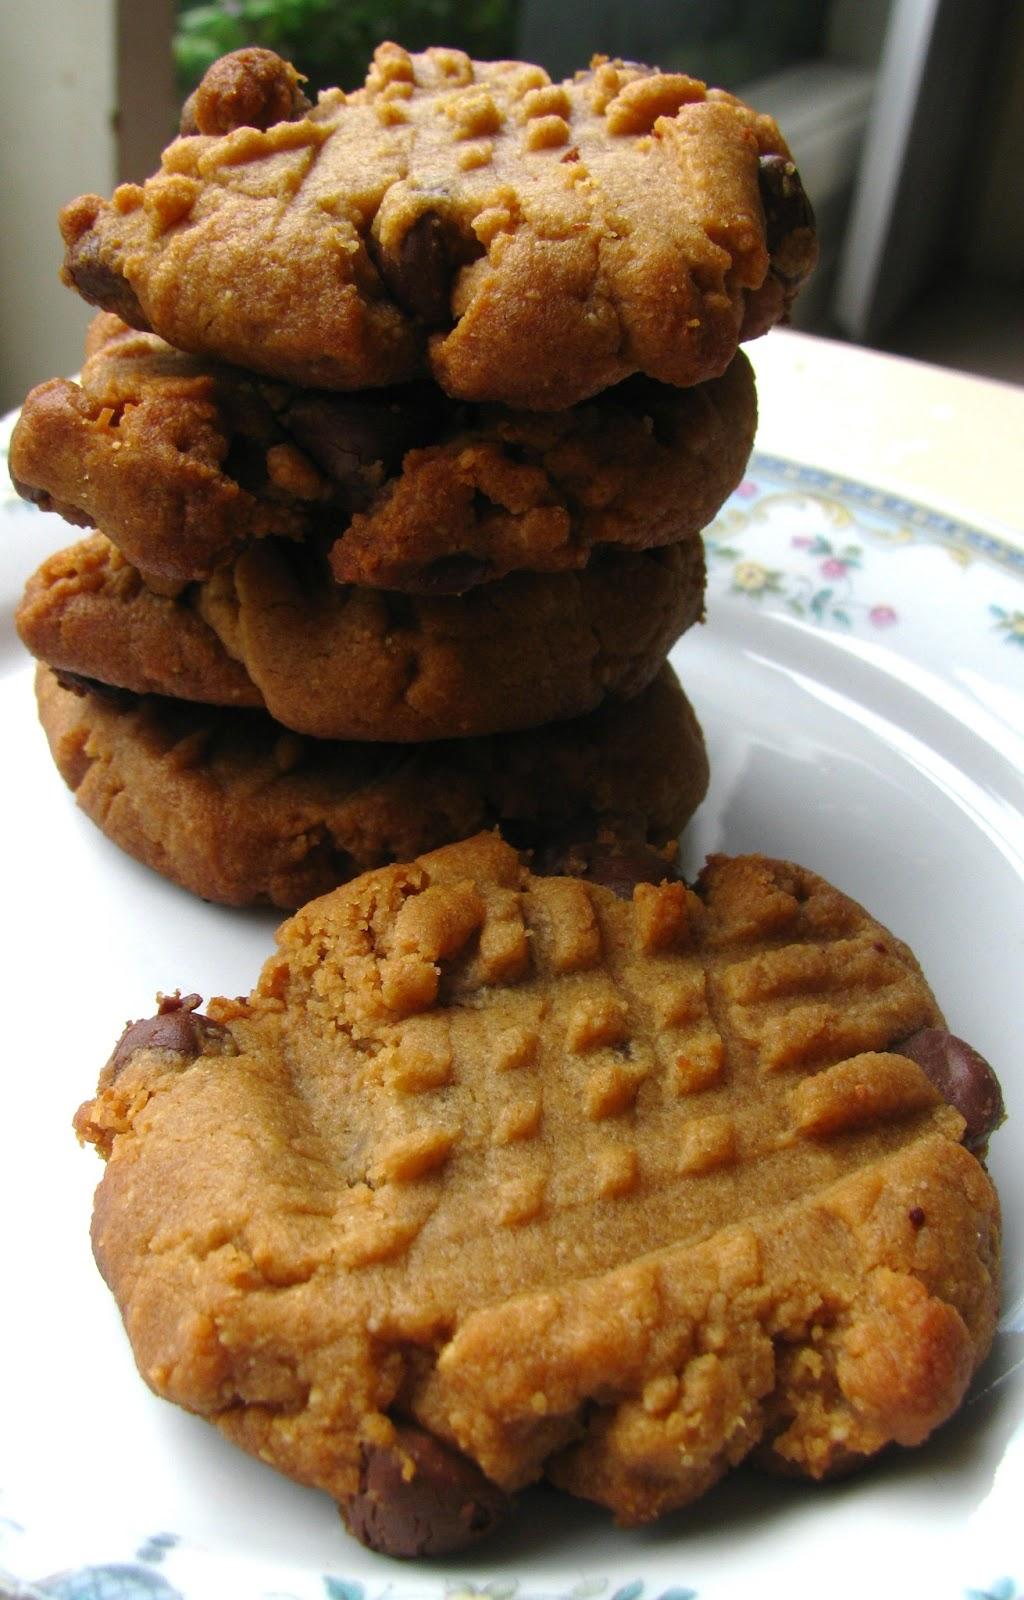 Flourless Peanut Butter Chocolate Chip Cookies | Proverbs 31 Woman